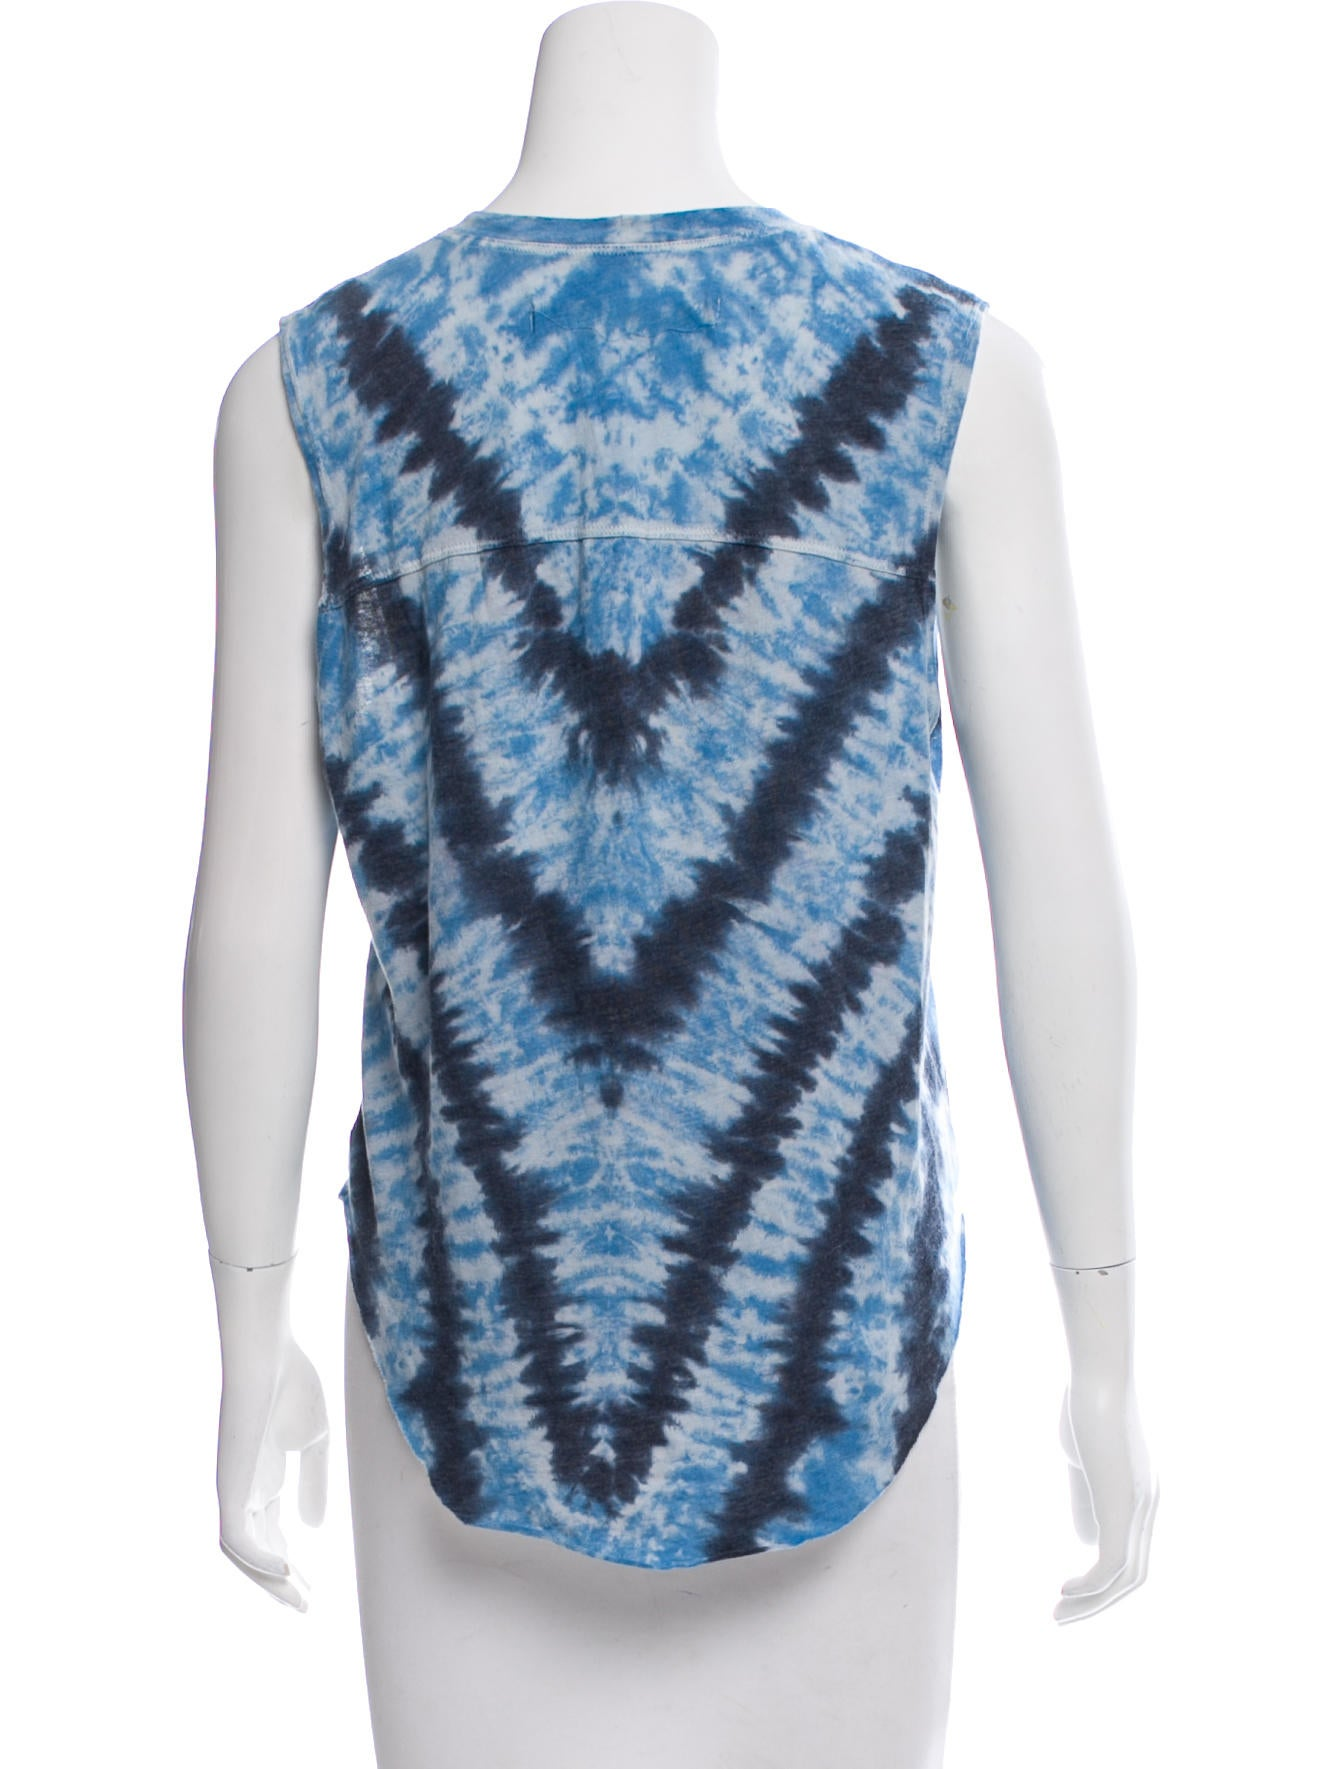 Raquel allegra tie dye sleeveless top clothing for Tie dye sleeveless shirts